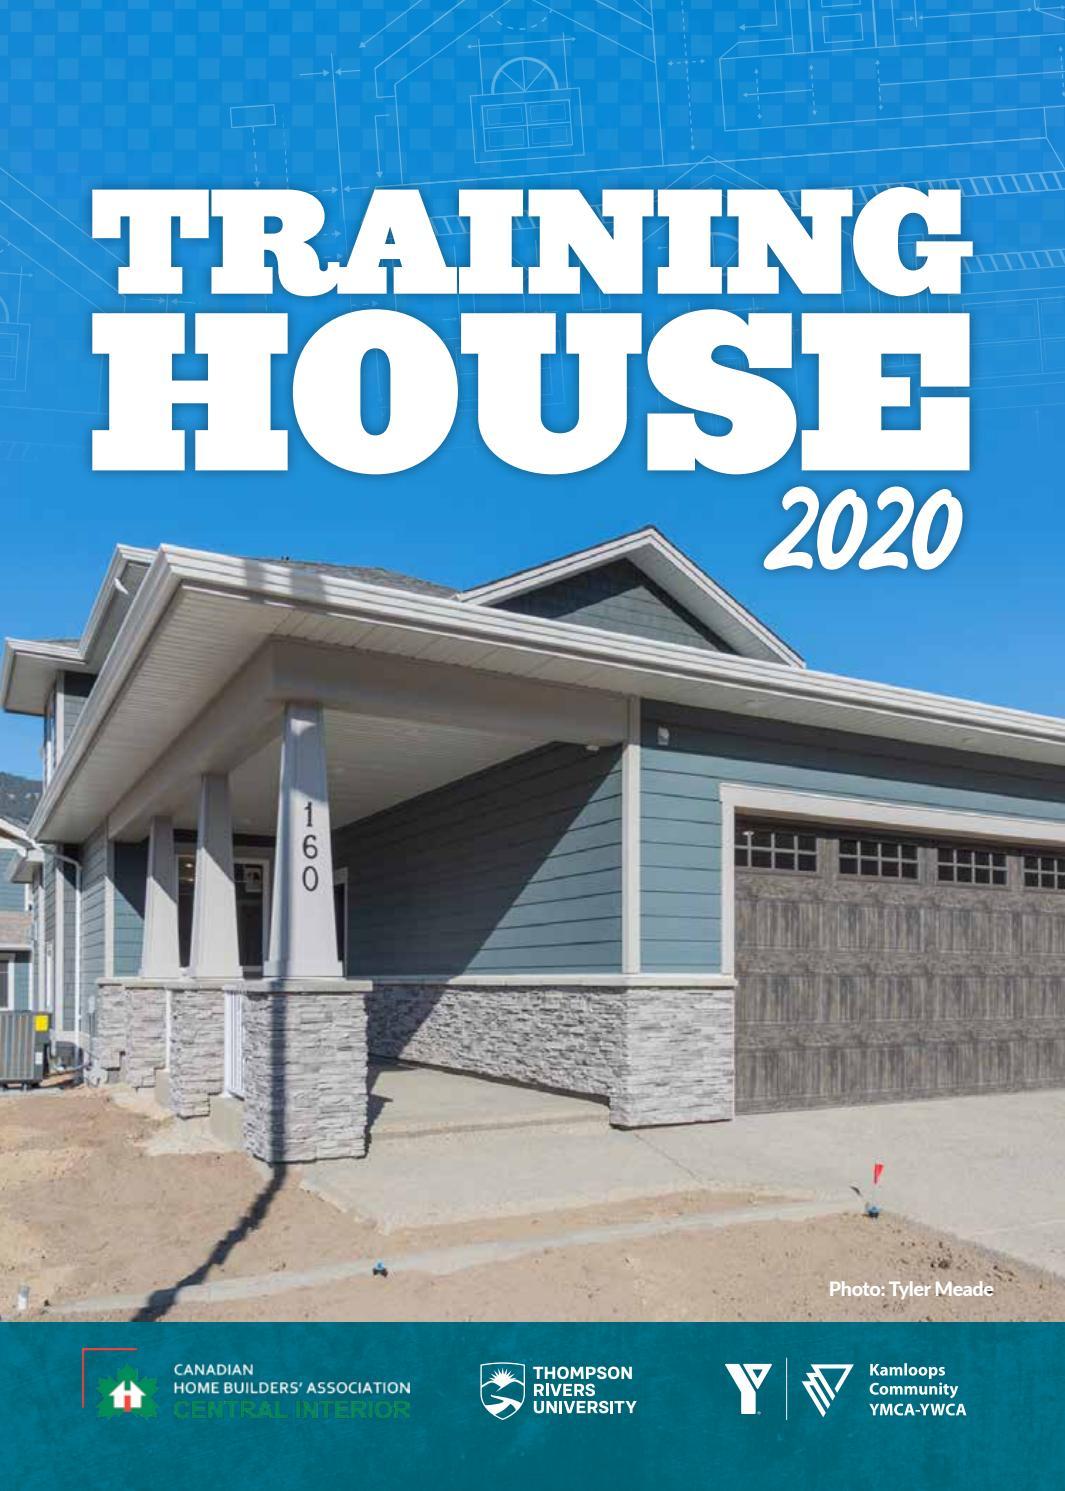 Training House 2020 By Kamloopsthisweek Issuu